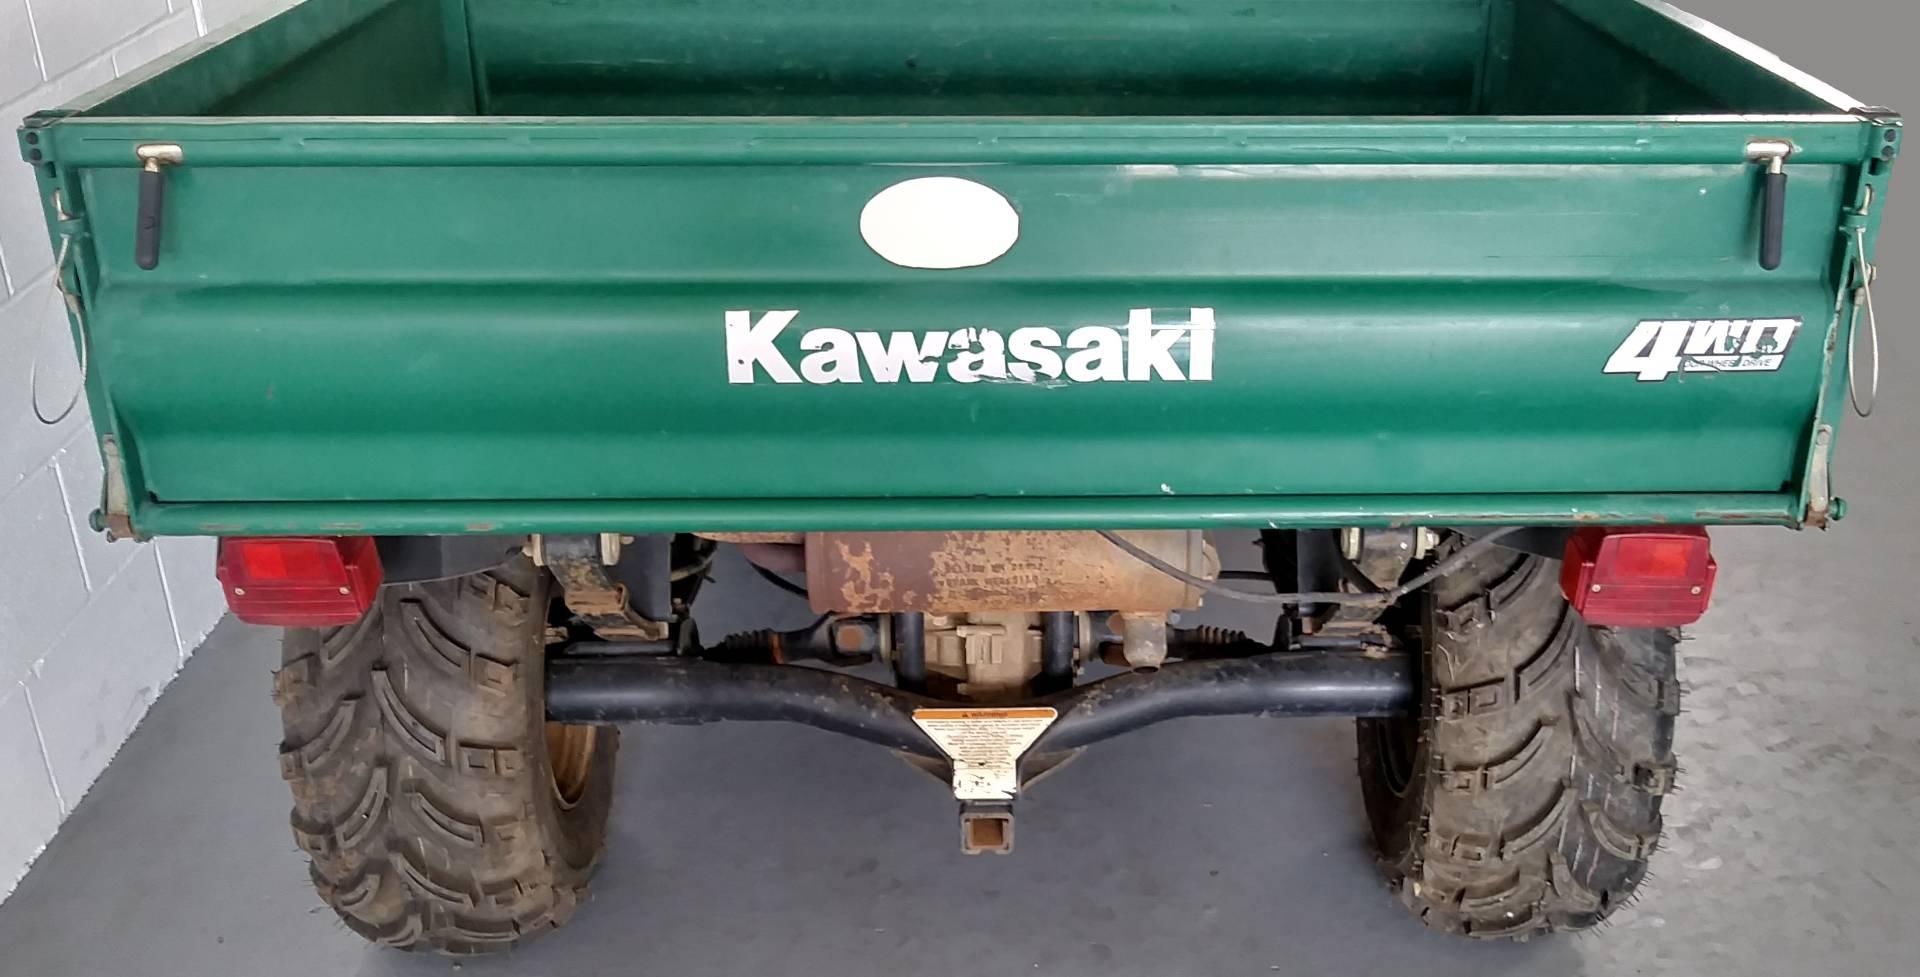 Kawasaki Mule 2510 Parts Diagram On Kawasaki Mule Parts Diagram Water